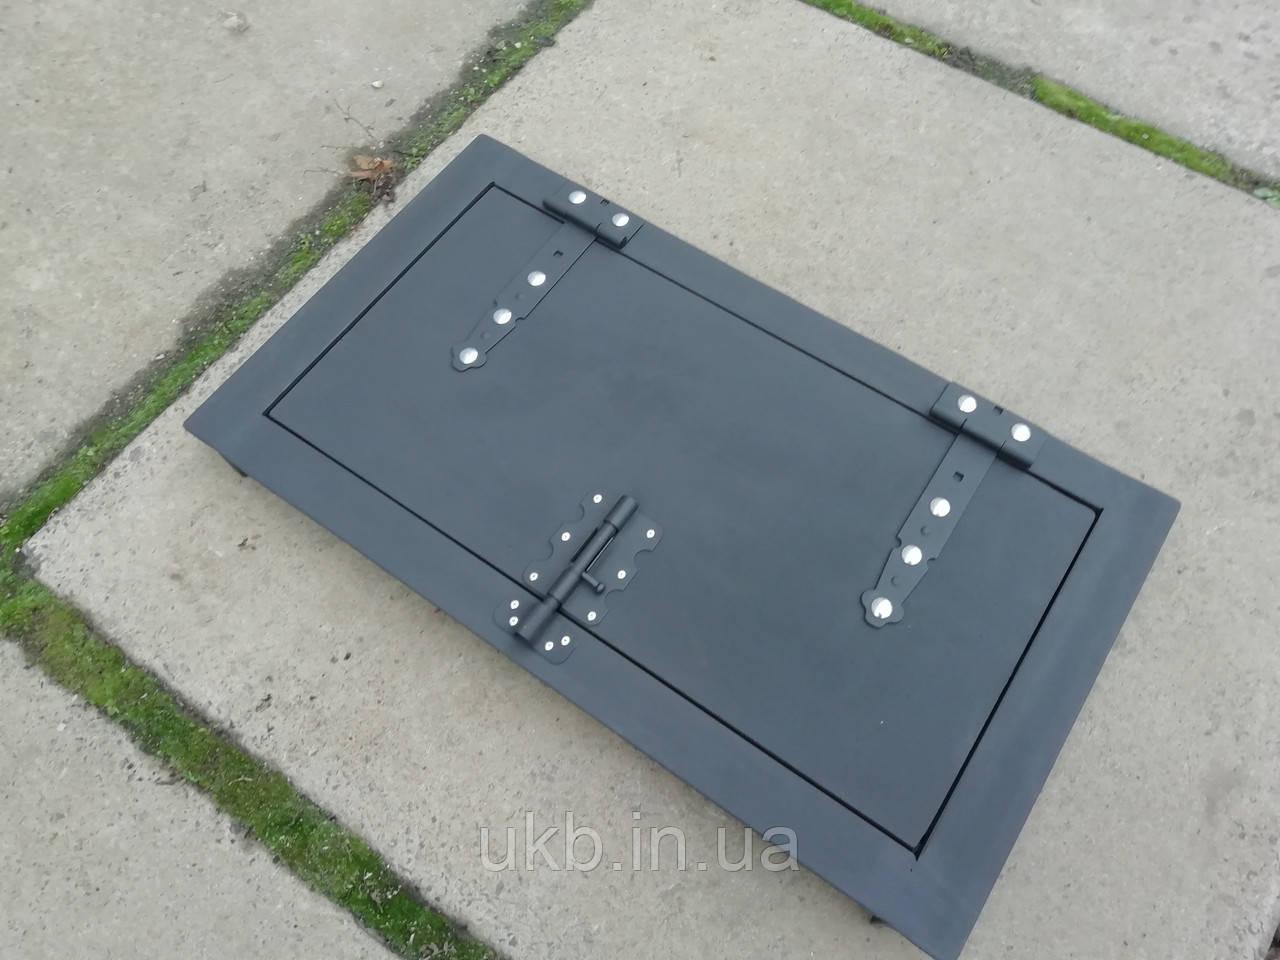 Дверка для коптильни чугунная 700*400 мм